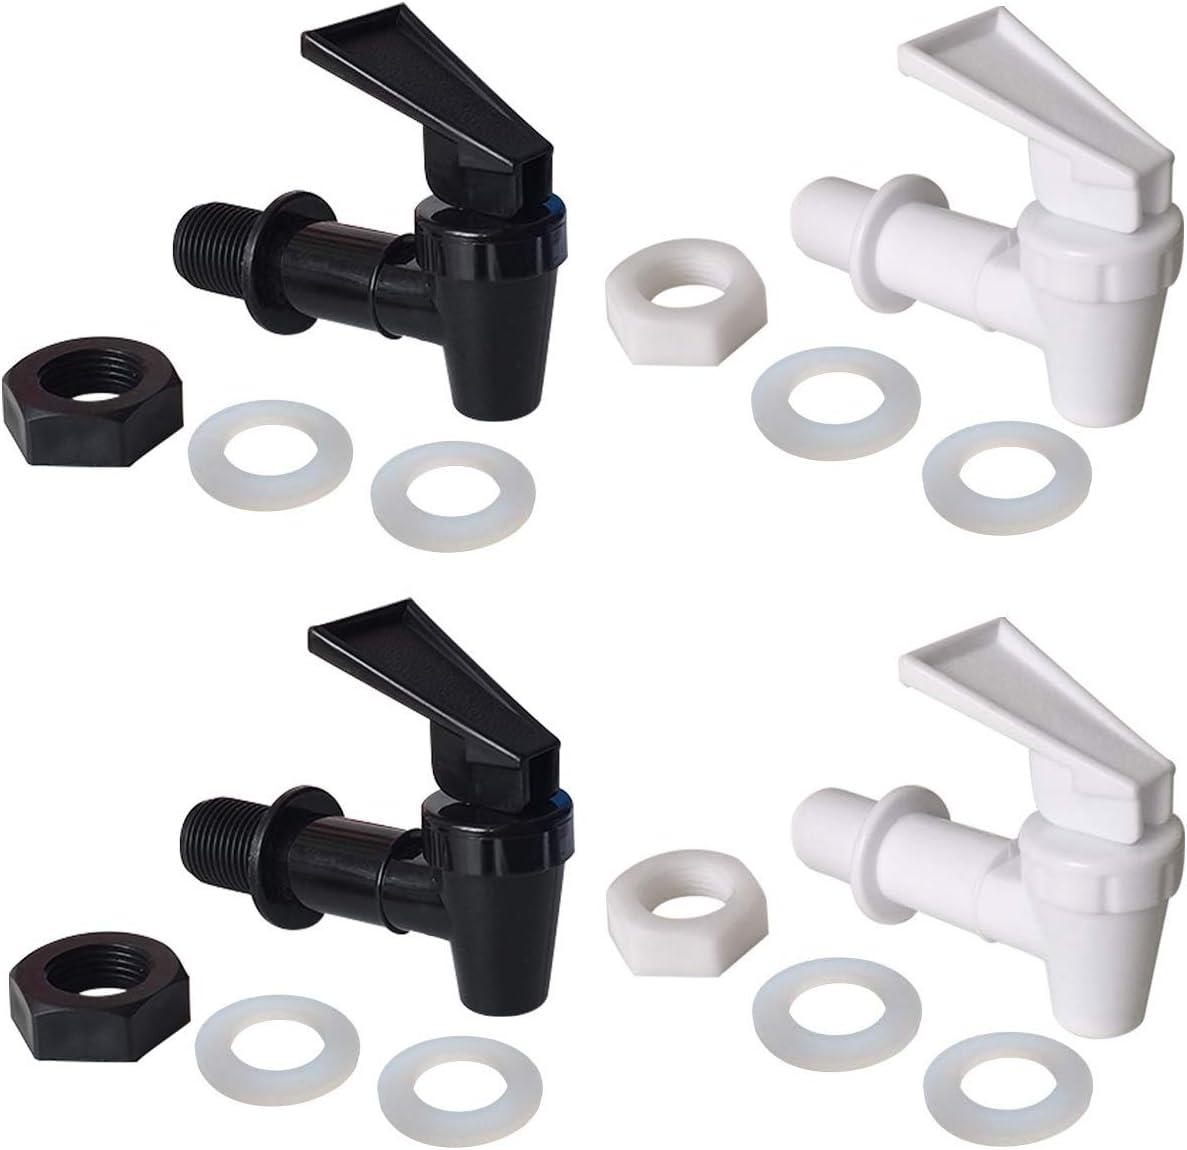 OHOH 4 Sets BPA-Free Replacement Cooler Faucet Water Bottle Jug, Reusable Spigot Spout Water Beverage Lever Pour Dispenser Valve Water Crock Tap(2 Black and 2 White)